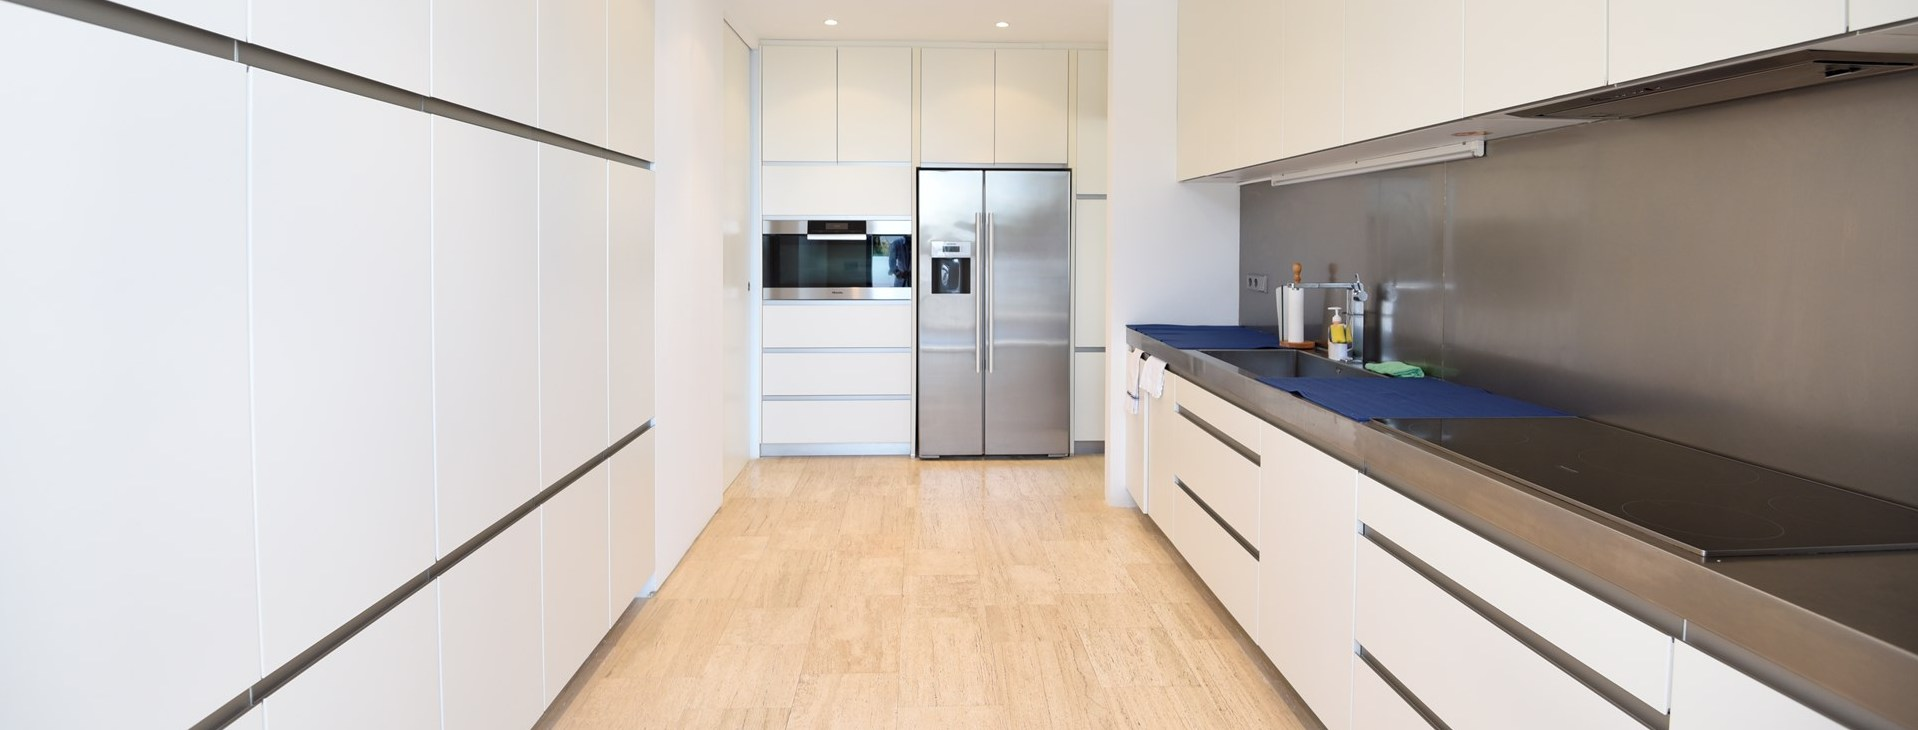 can-castello-professional-kitchen